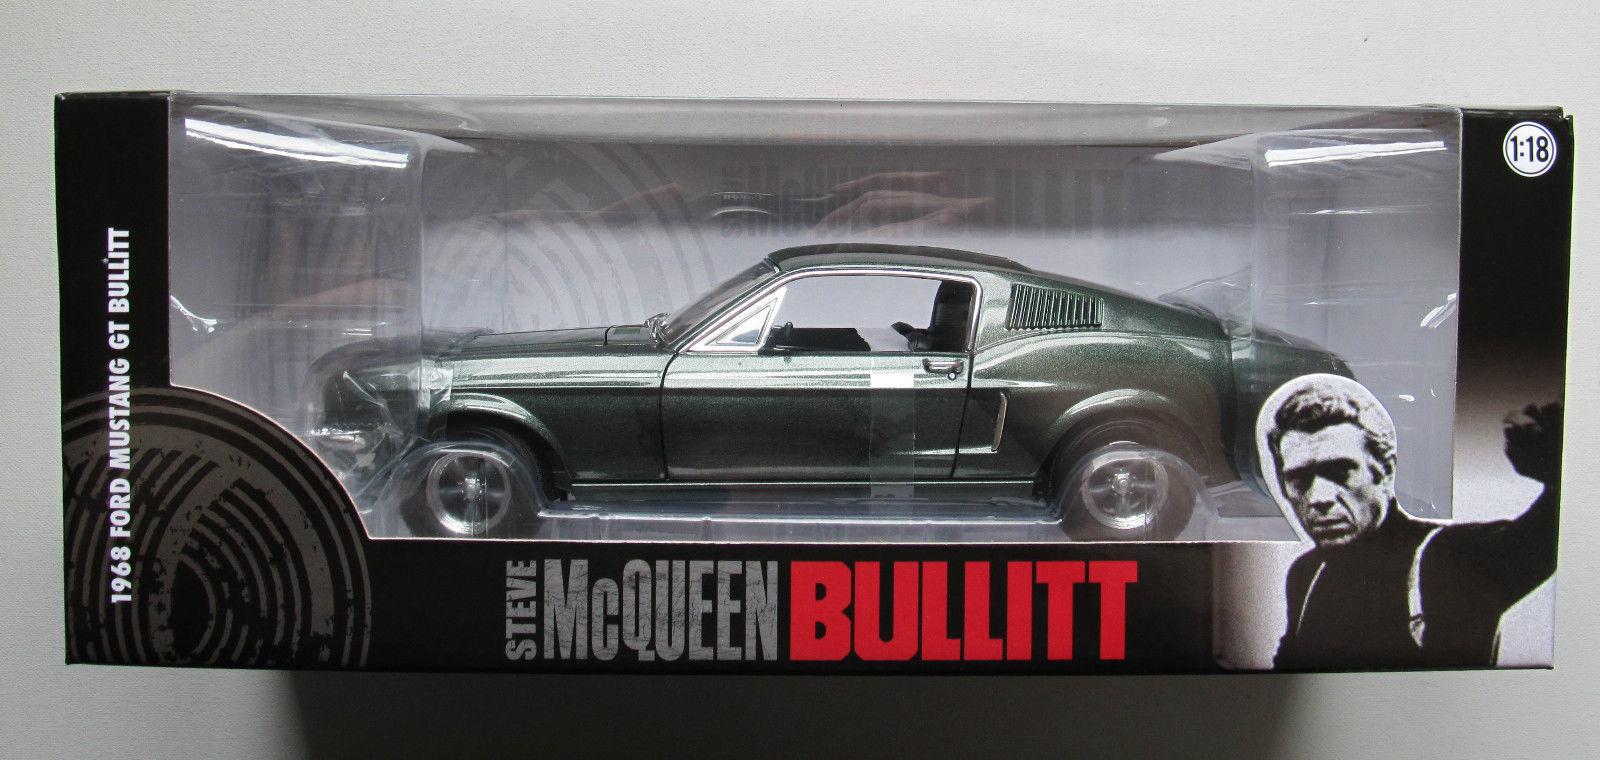 1 18 vertlight 1968 Ford Mustang Steve McQueen Bullitt